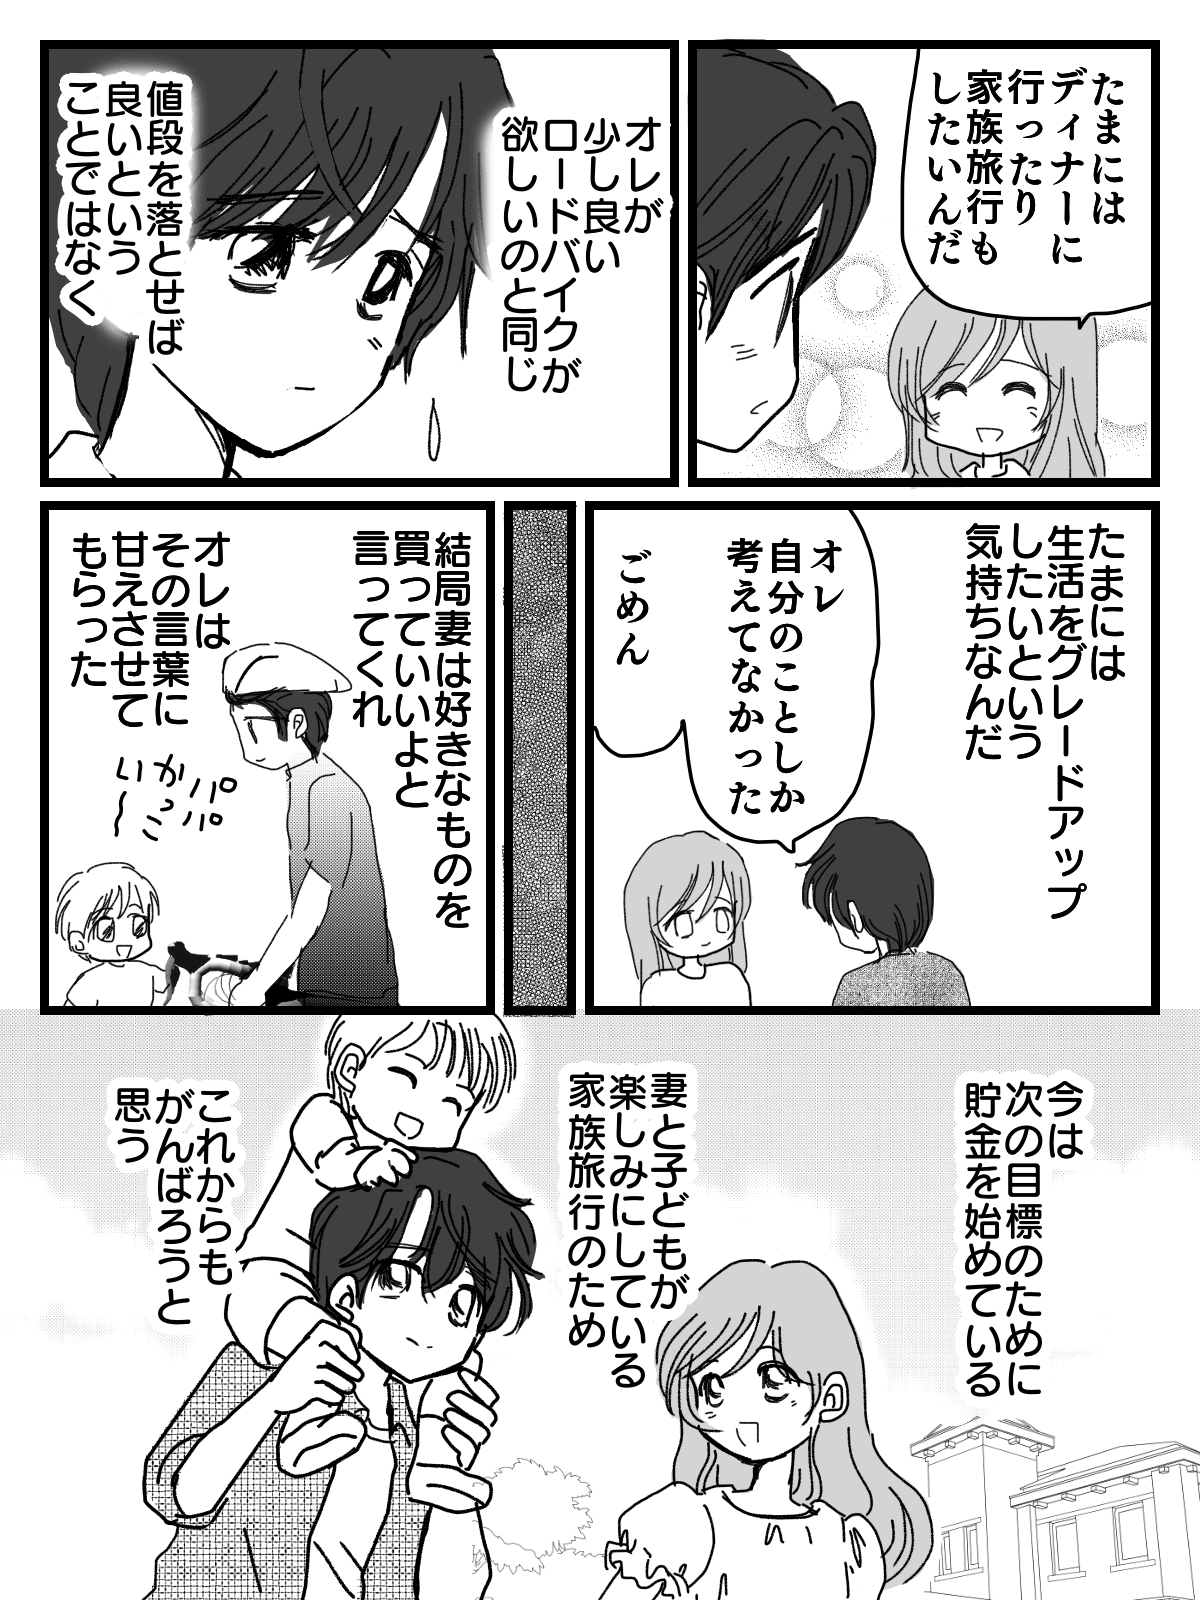 3-3 (1)